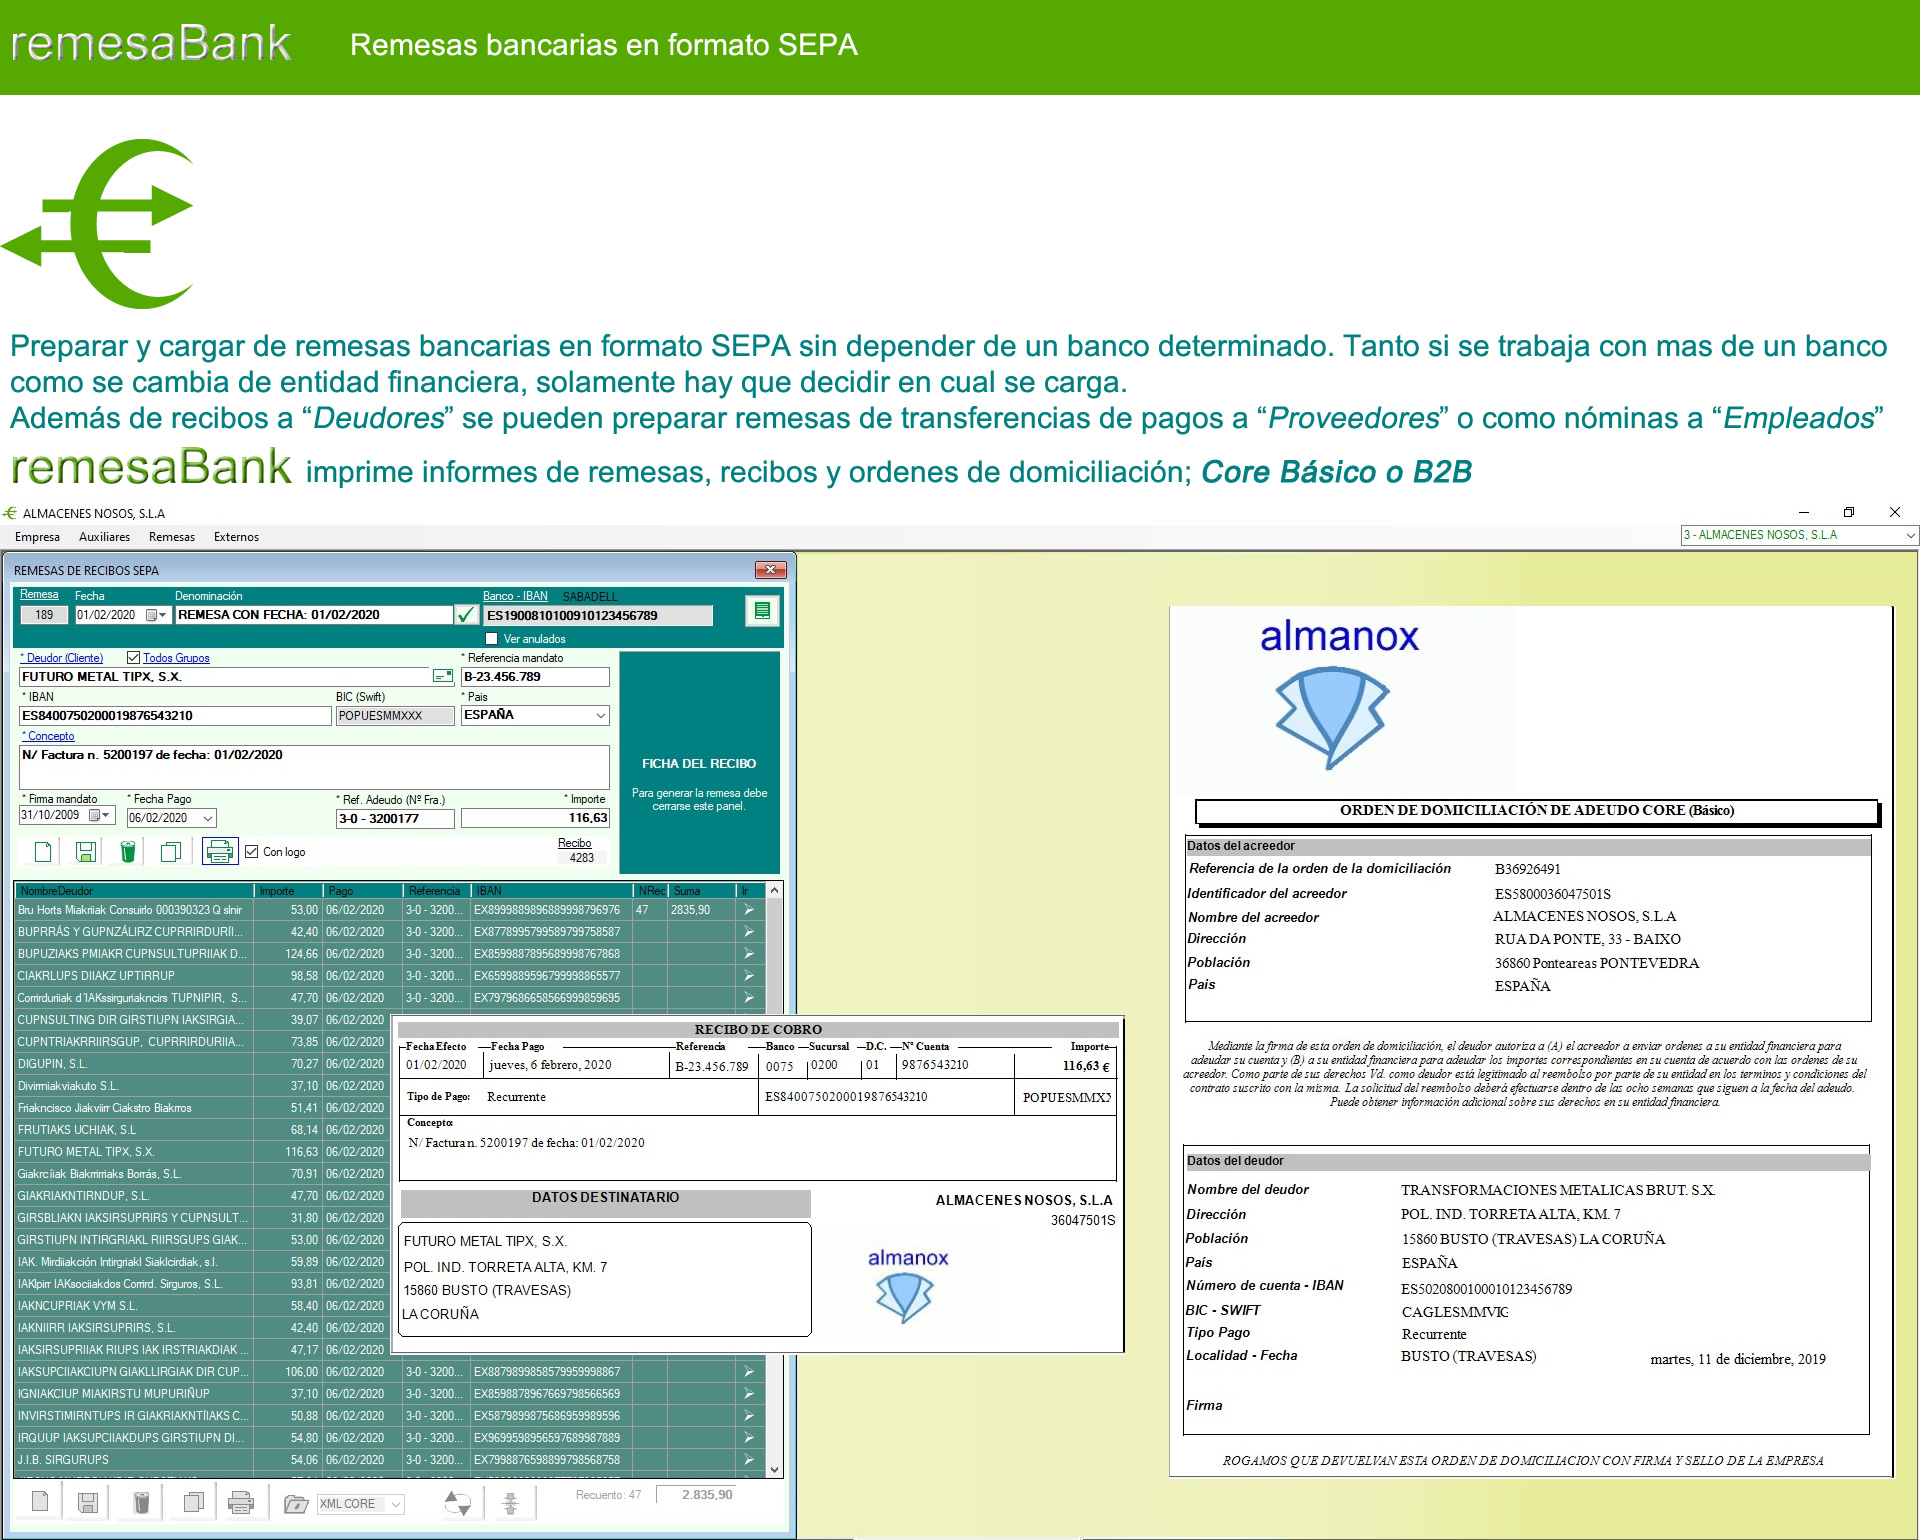 Remesabank - Remesas bancarias en formato SEPA